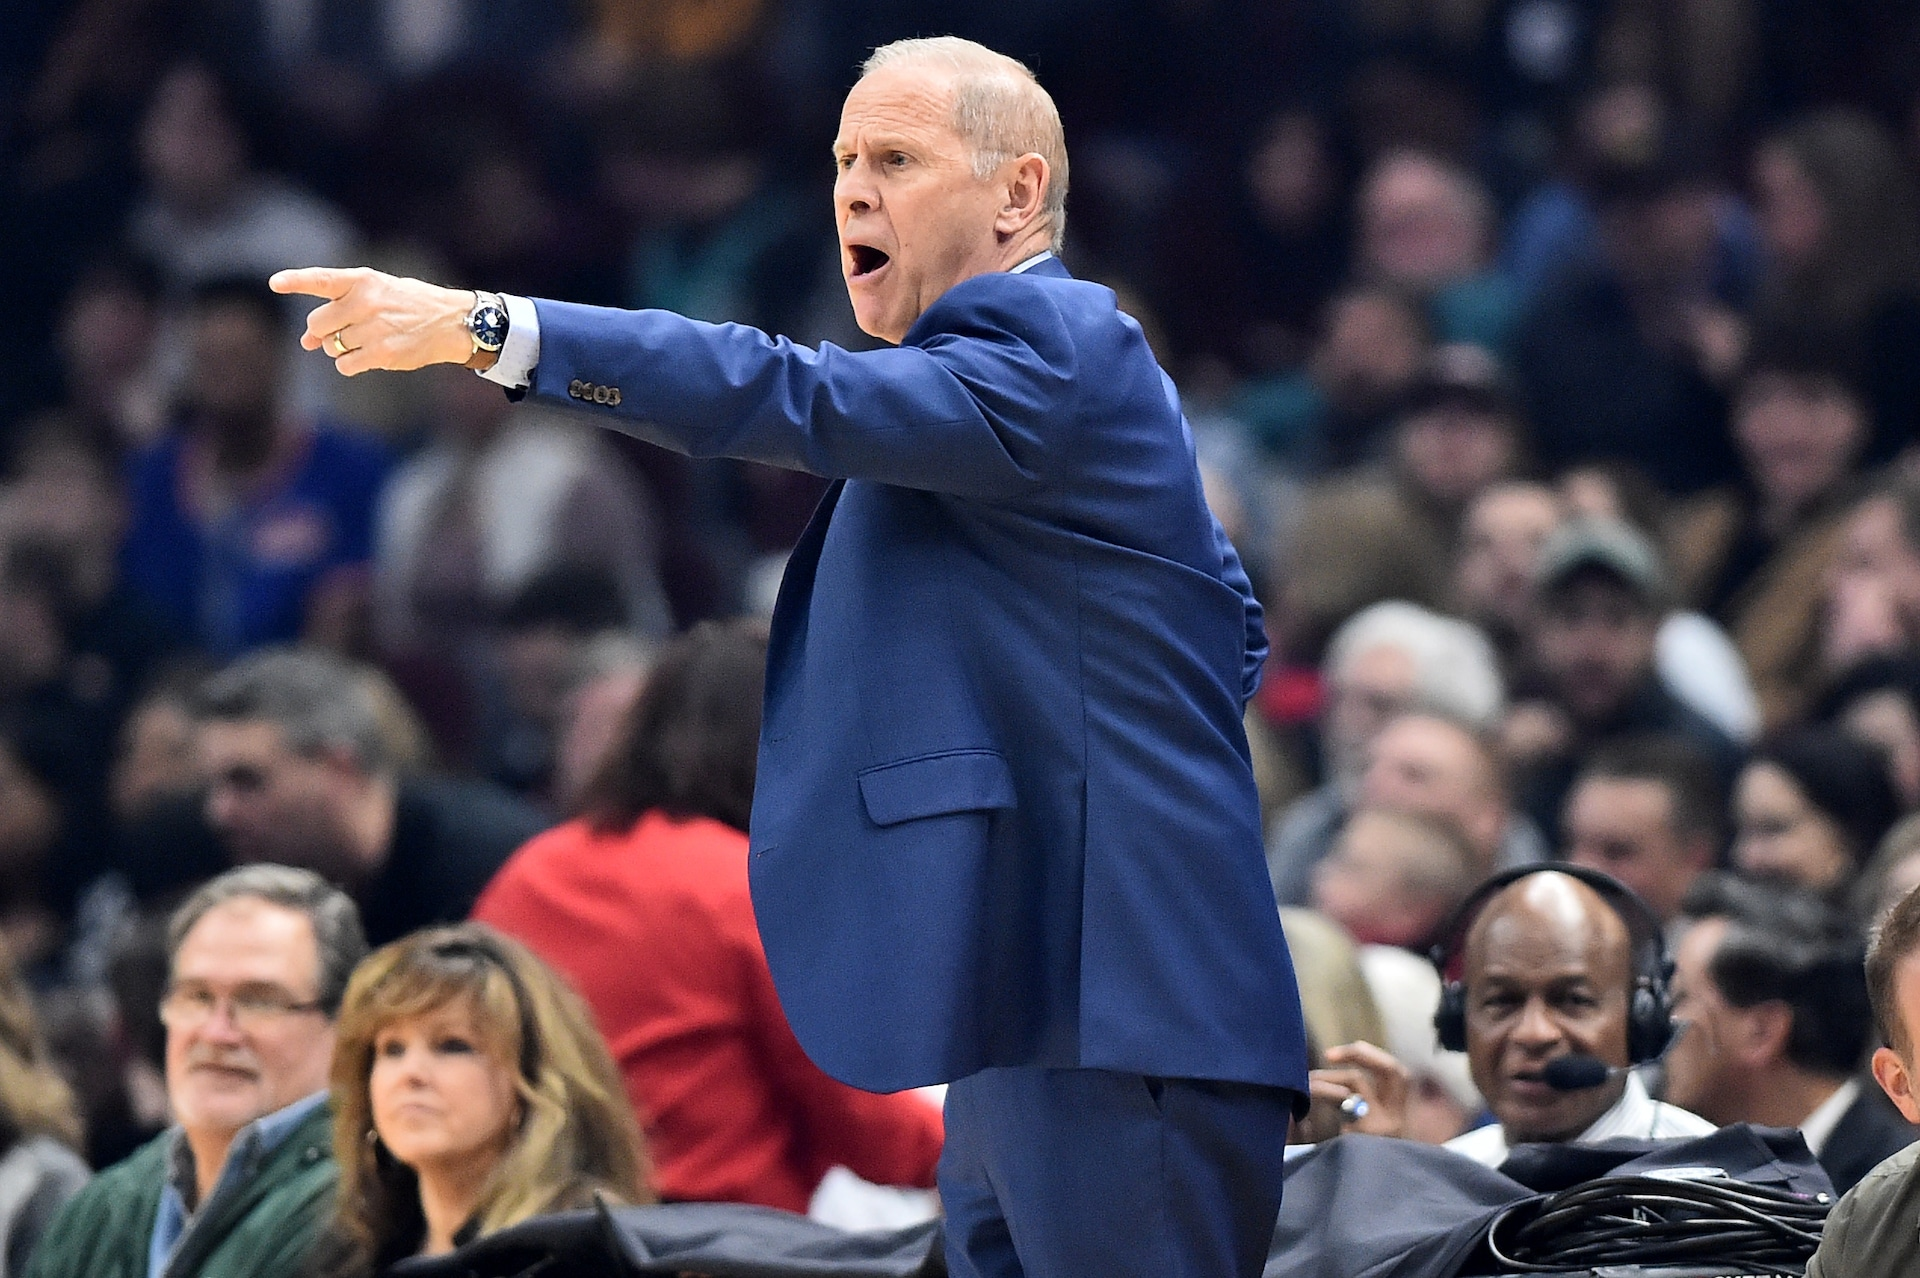 Reports: Cavaliers, coach John Beilein to part ways on Wednesday